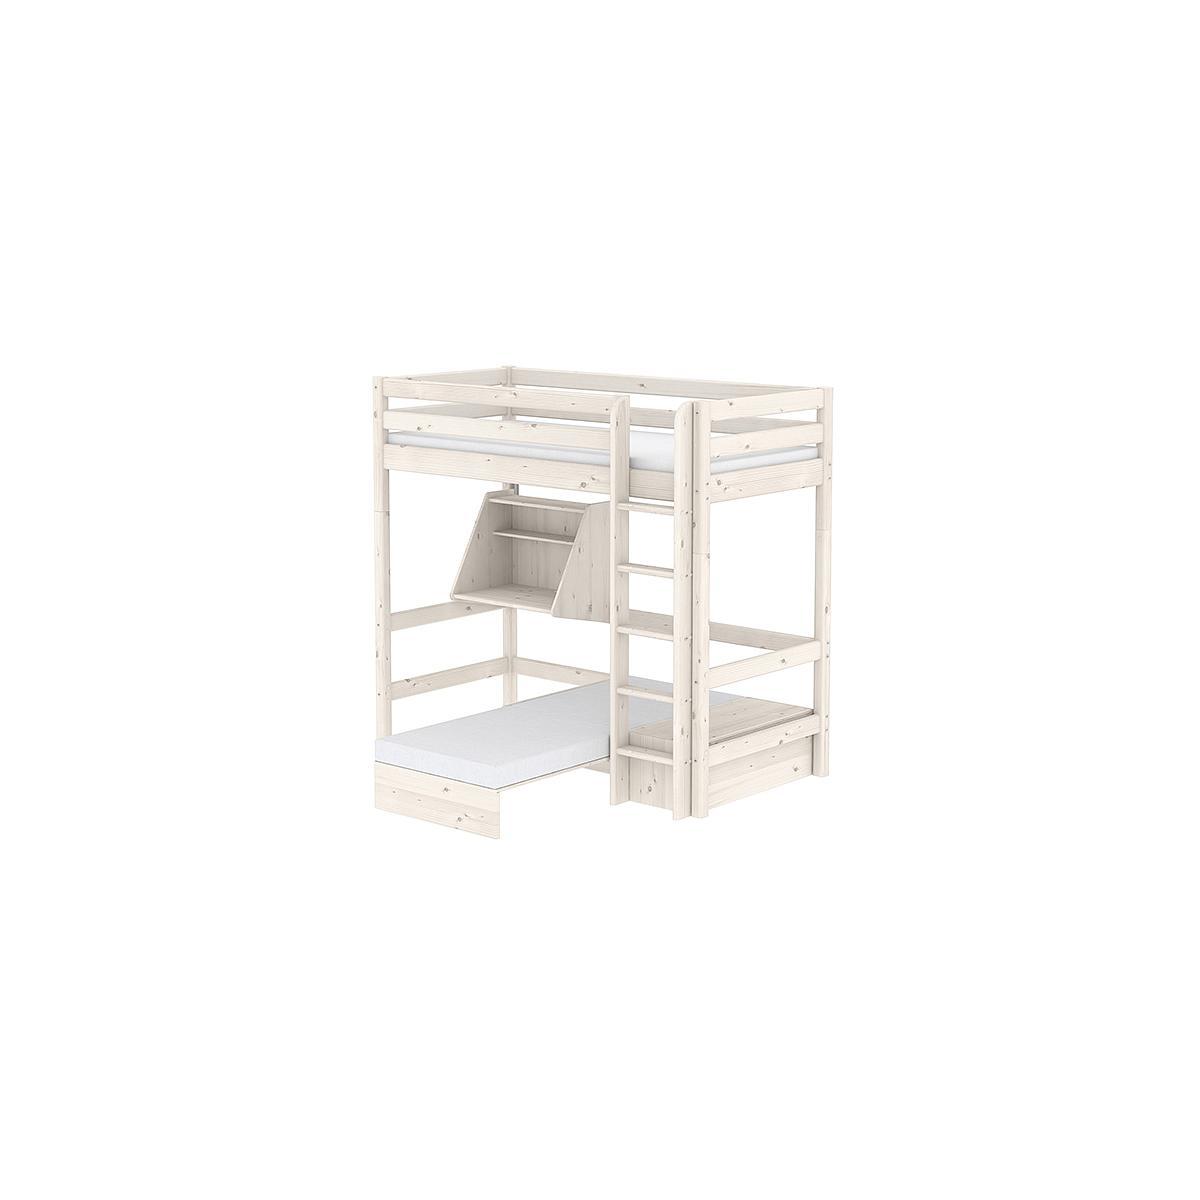 Cama alta Casa 90x200 CLASSIC Flexa escalera recta blanco cal